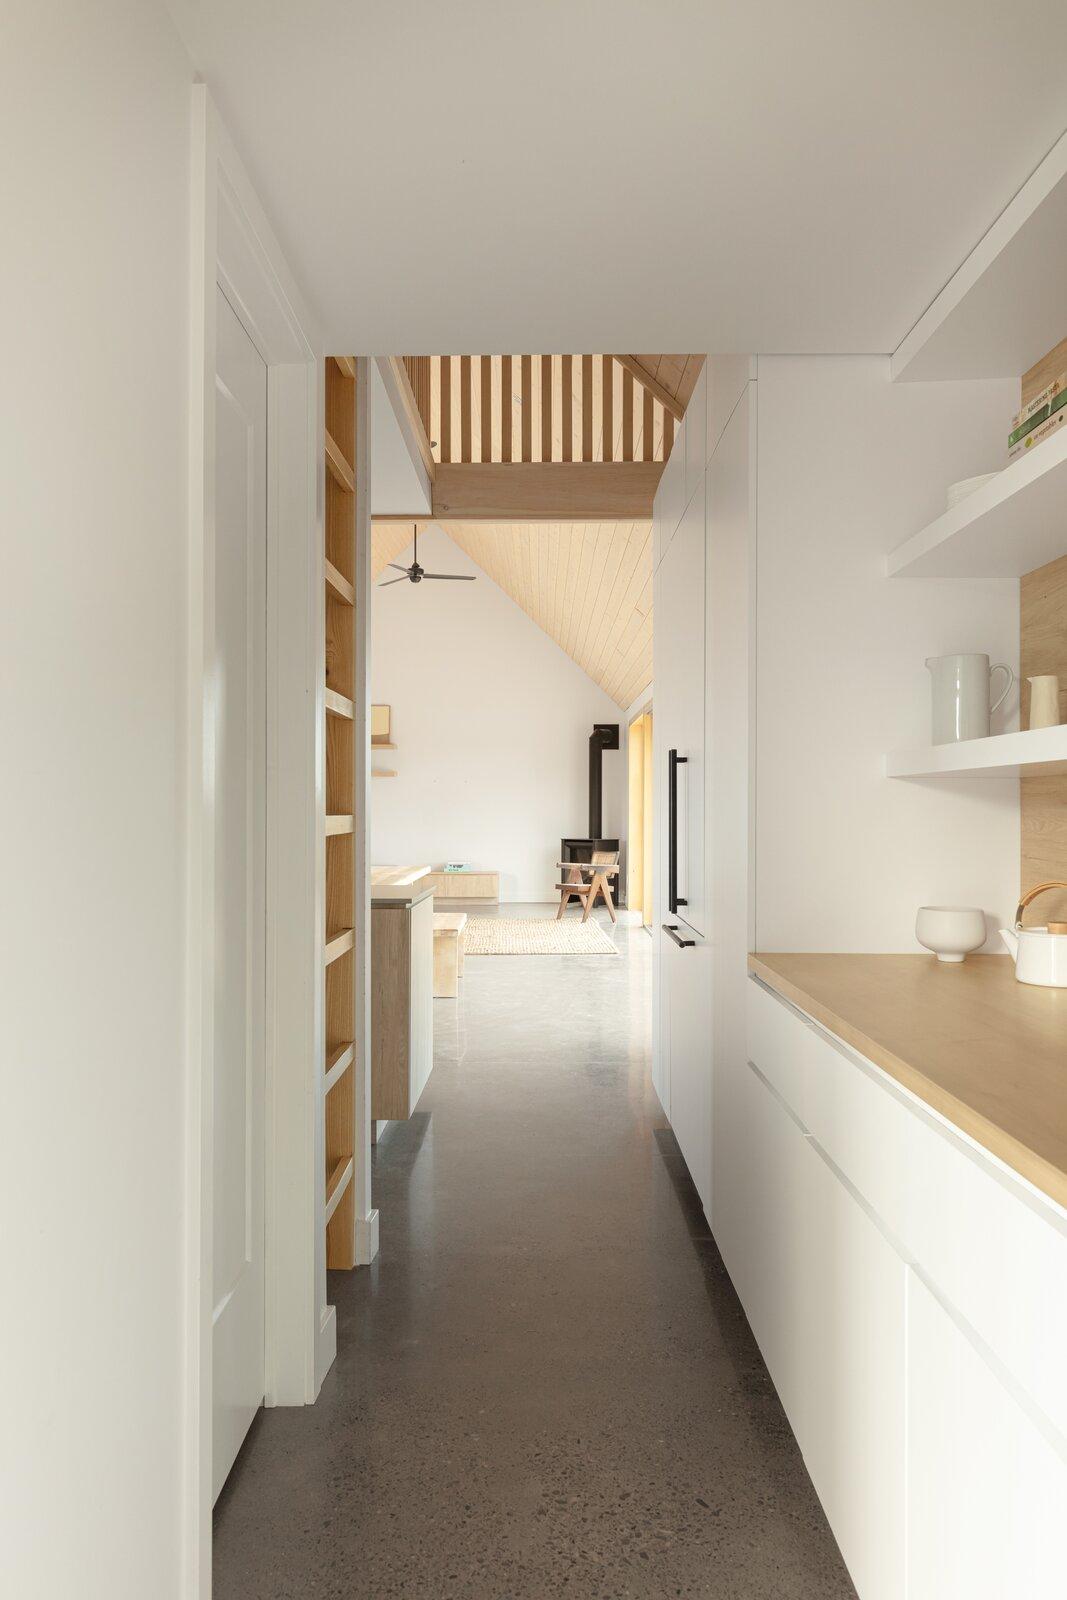 Ravi Handa Architect and AAmp Studio Ell House pantry